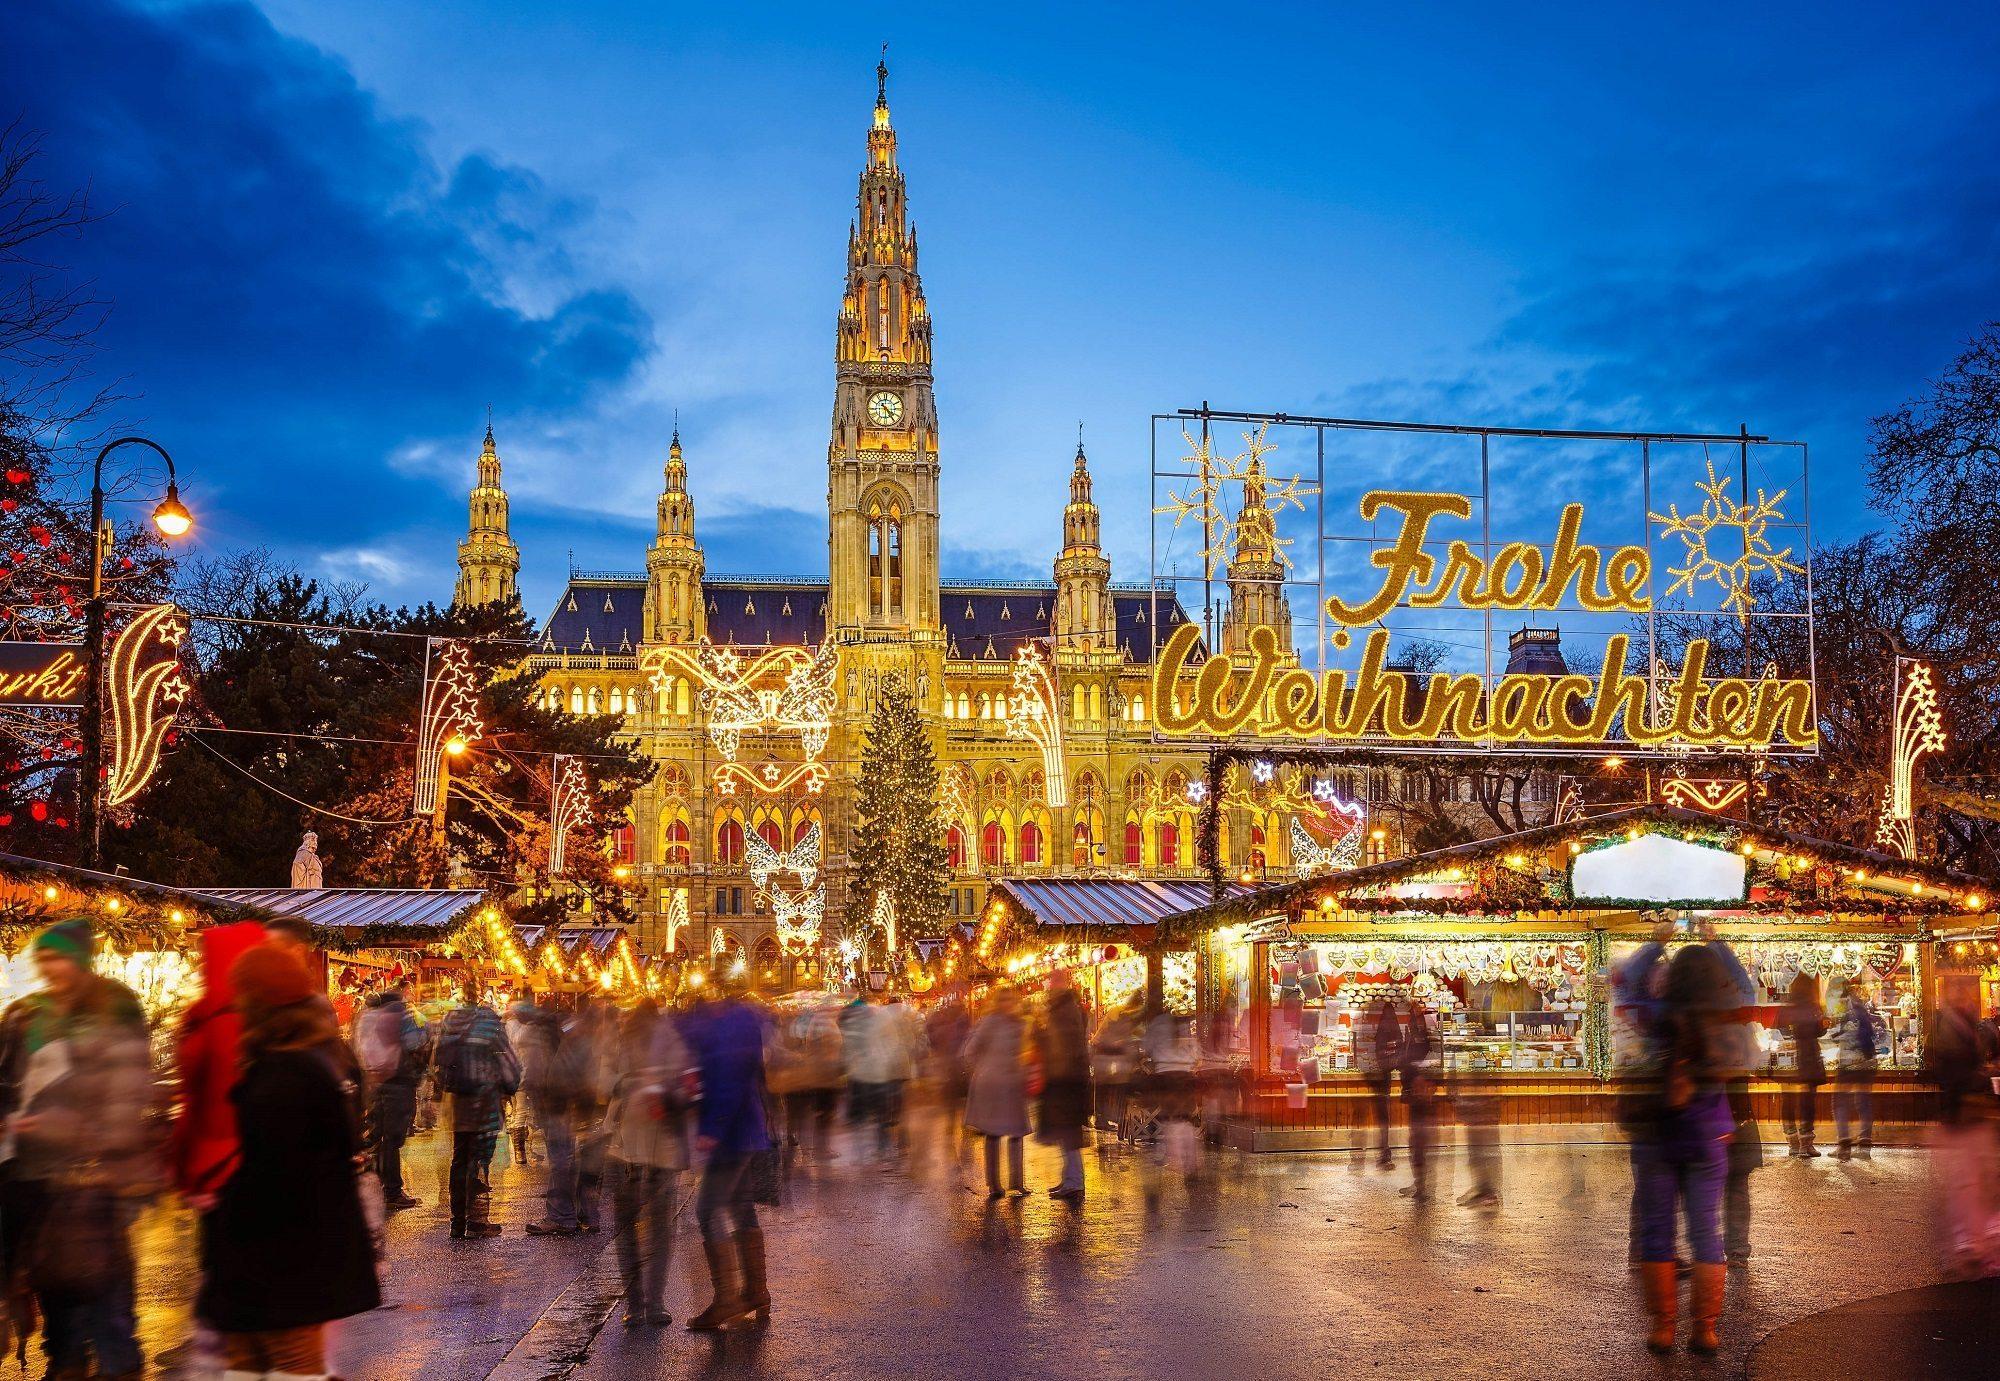 De 7 Leukste Mooiste Kerstmarkten In Europa Reistips Nl